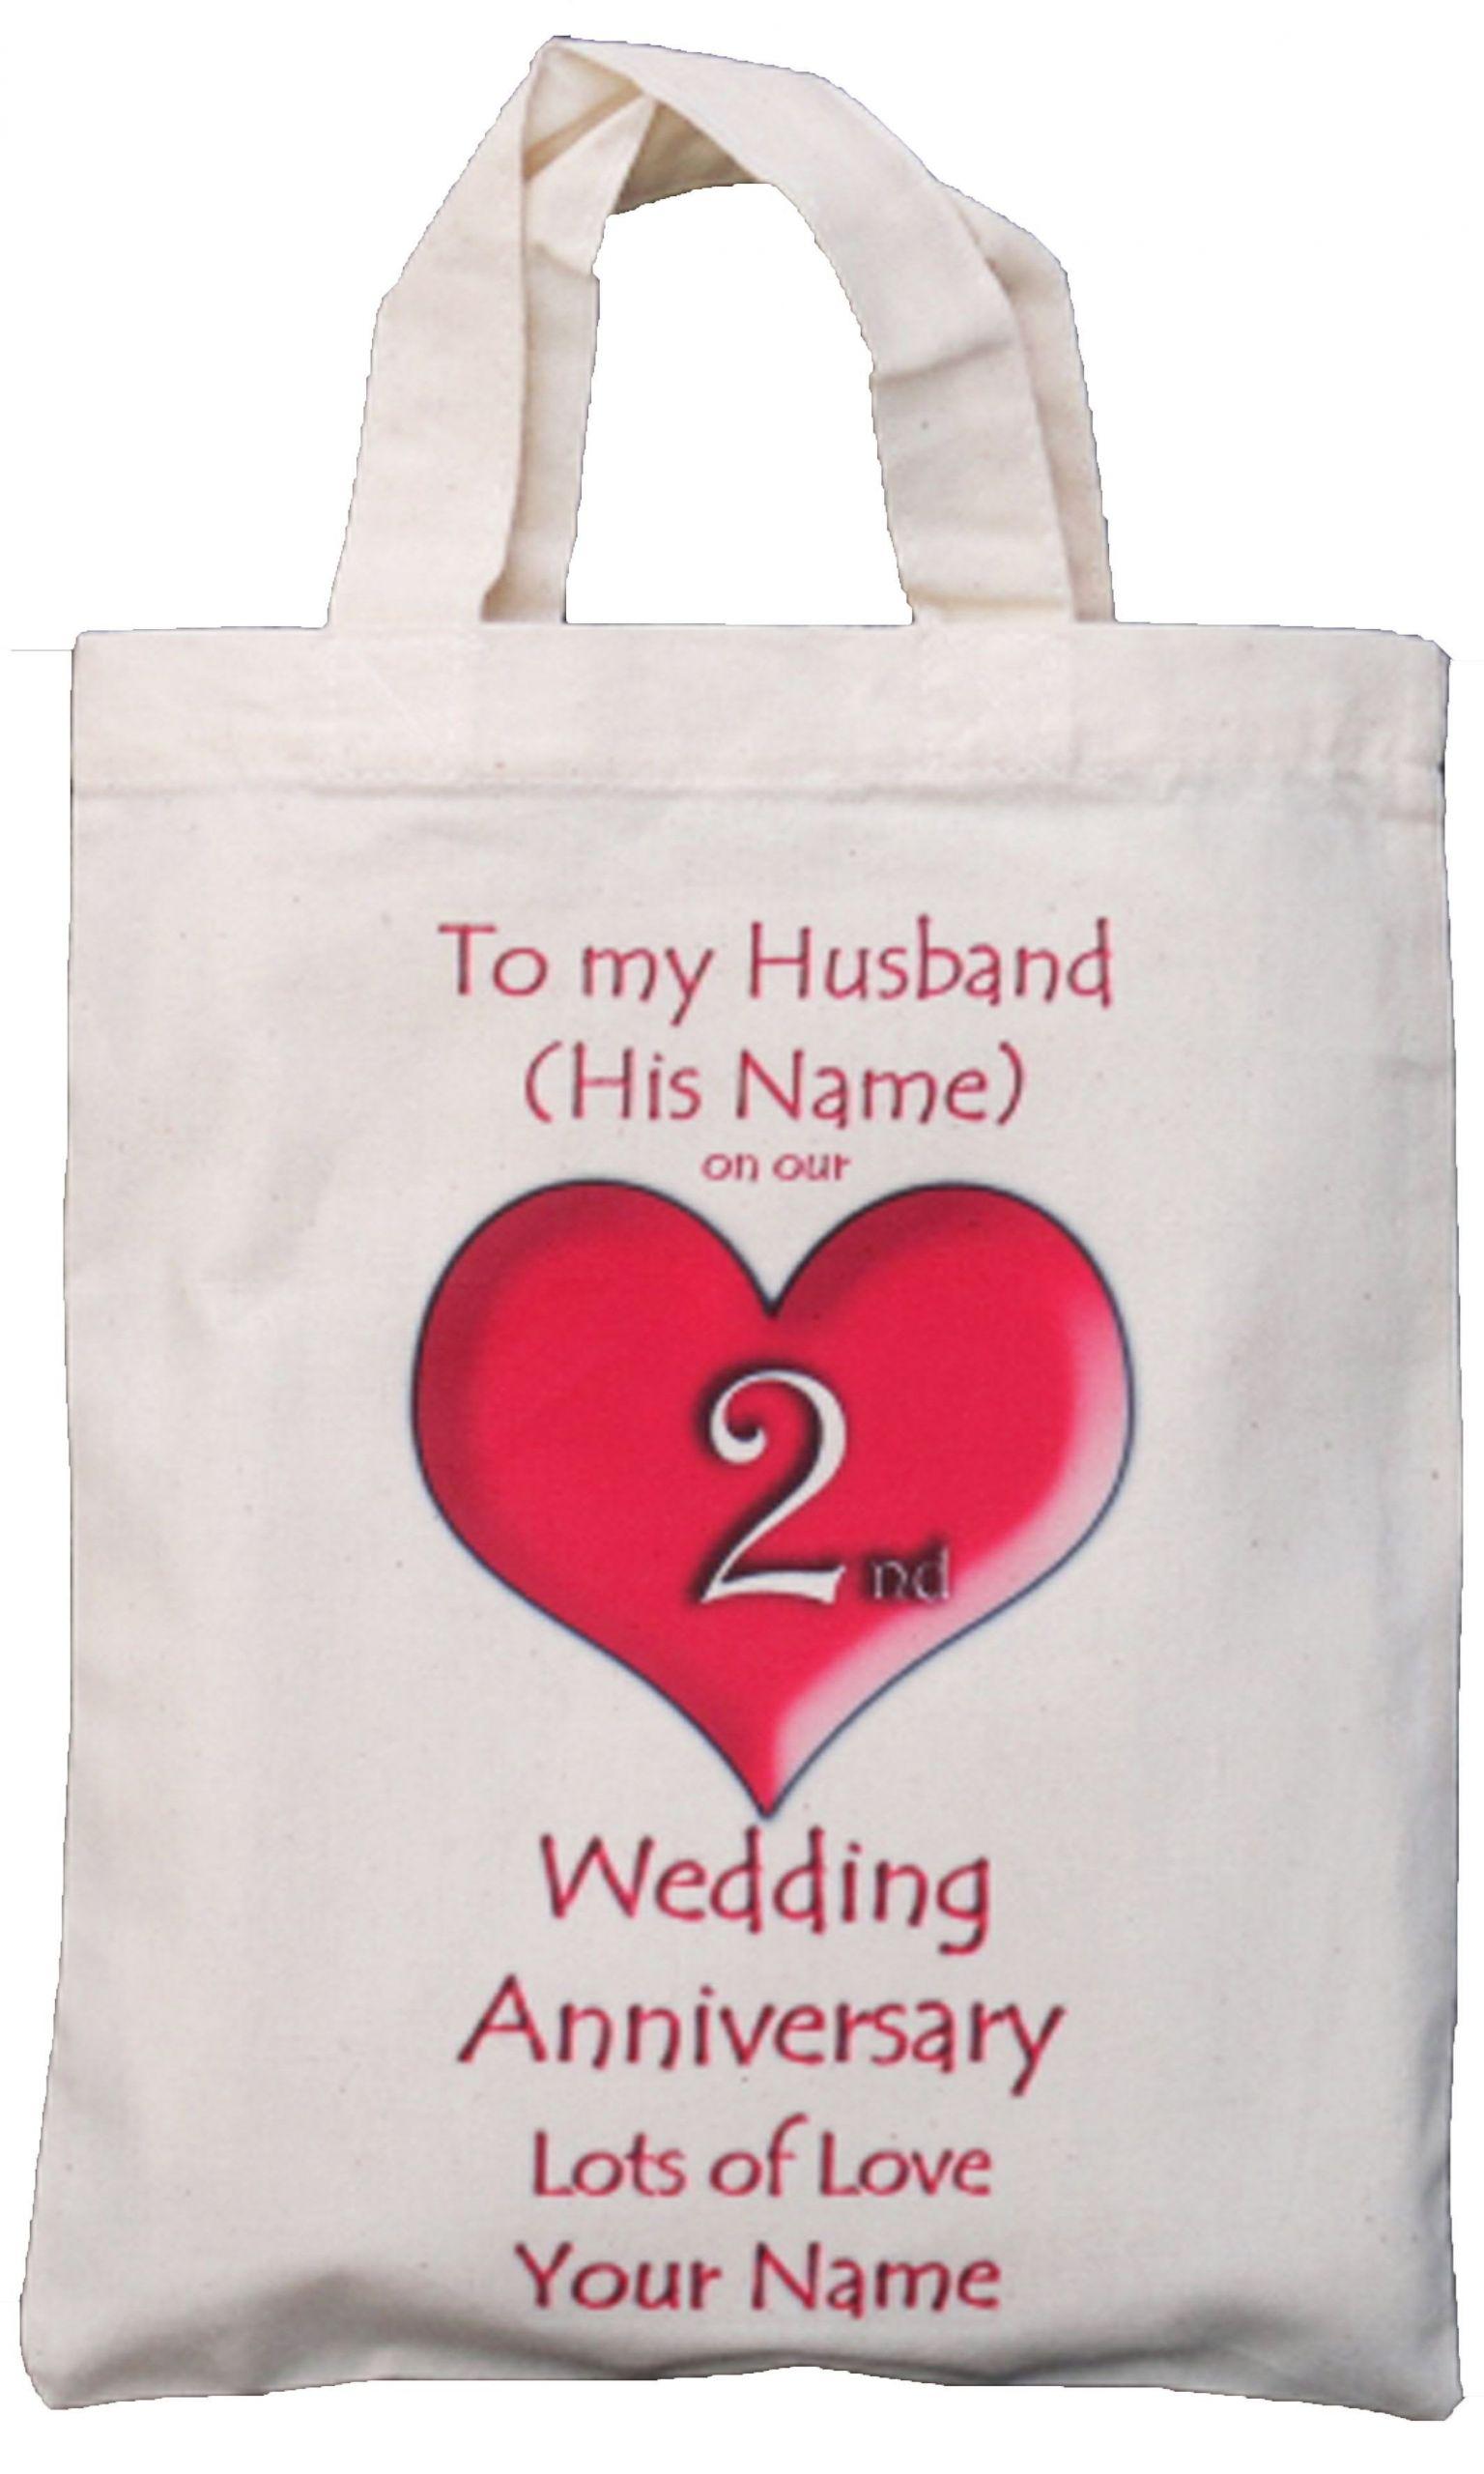 Husband Anniversary Gift Ideas  10 Fabulous Second Anniversary Gift Ideas For Husband 2020